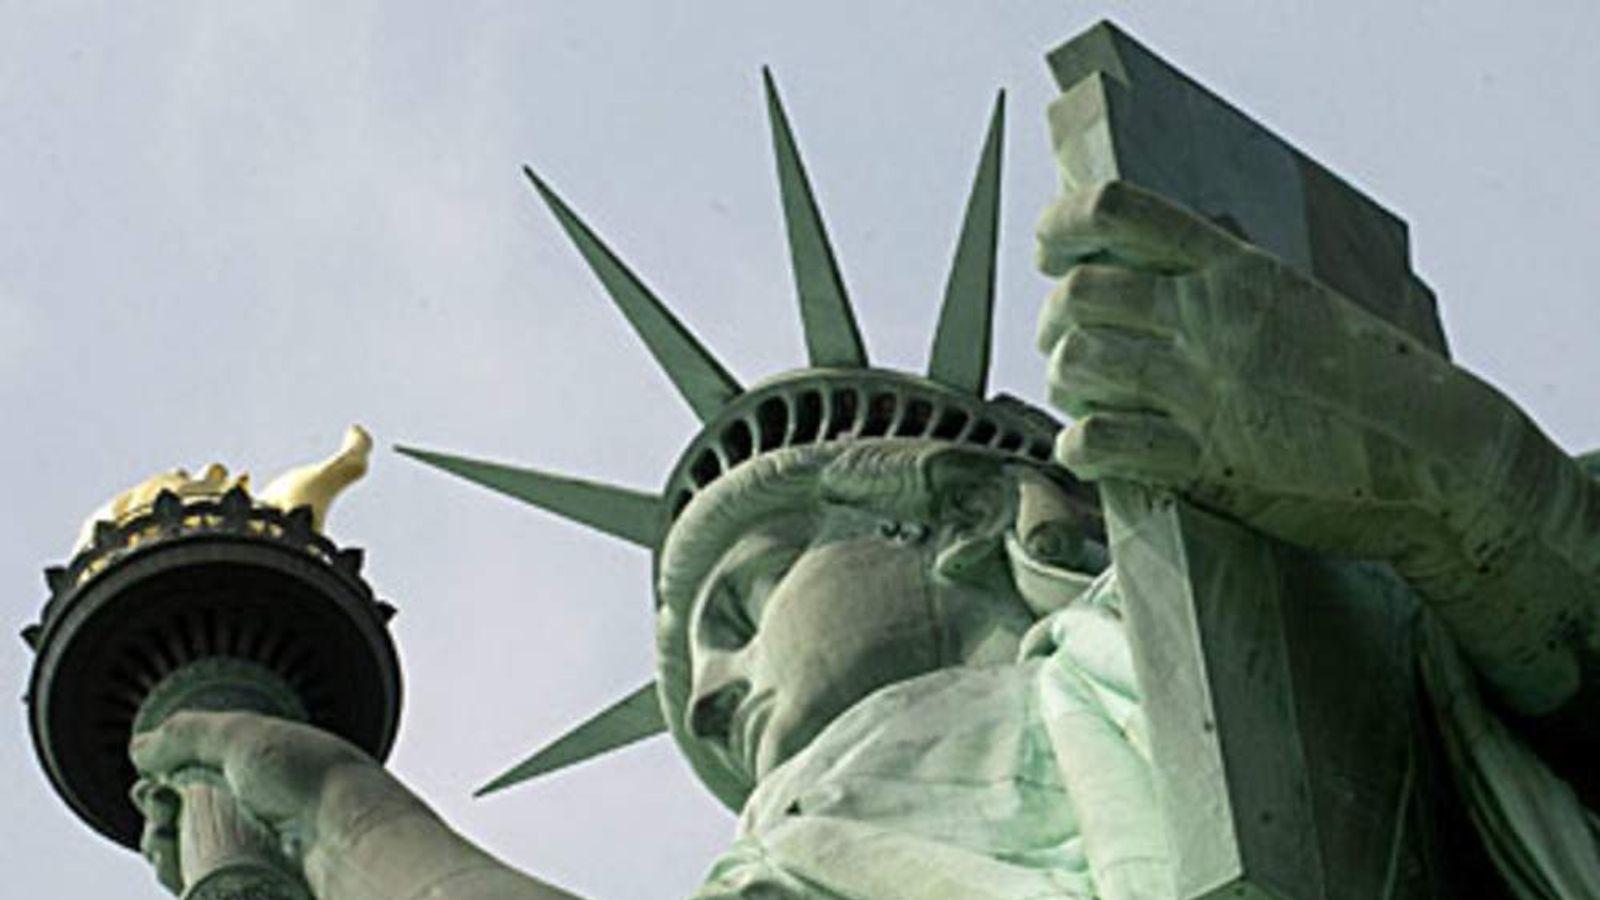 95 Statue of Liberty